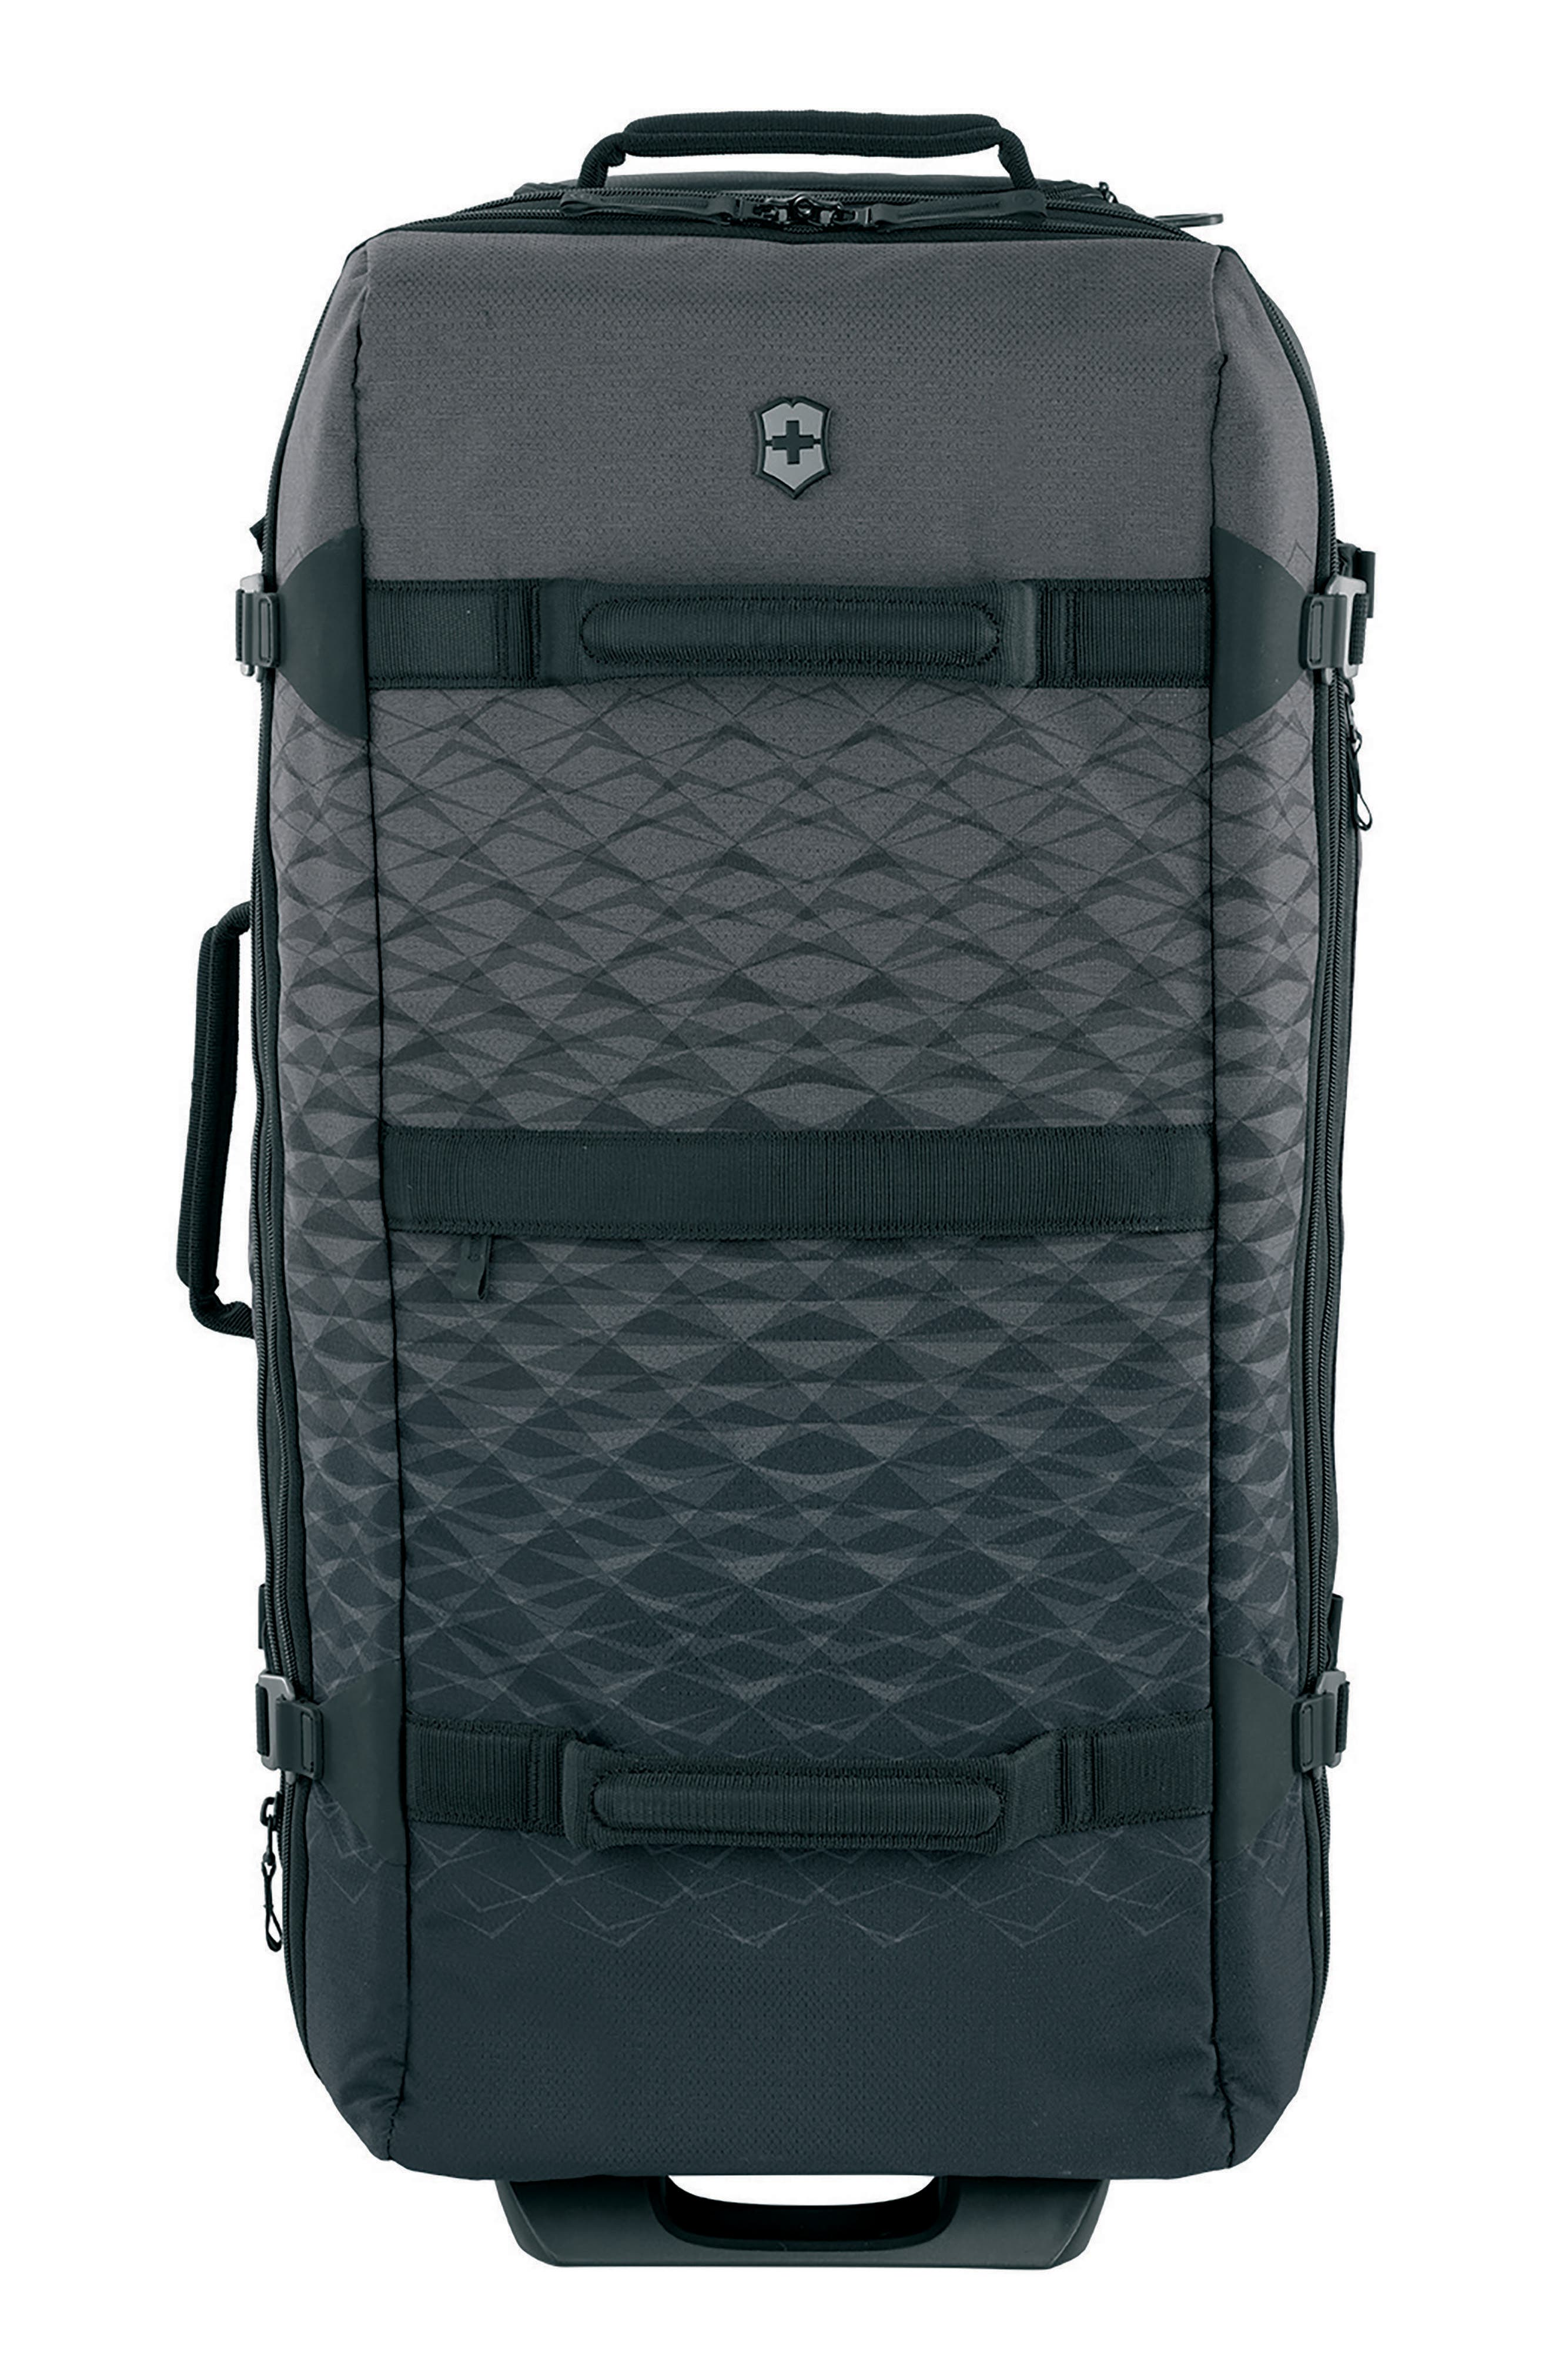 Victorinox Swiss Army® VX Touring Large Wheeled Duffel Bag